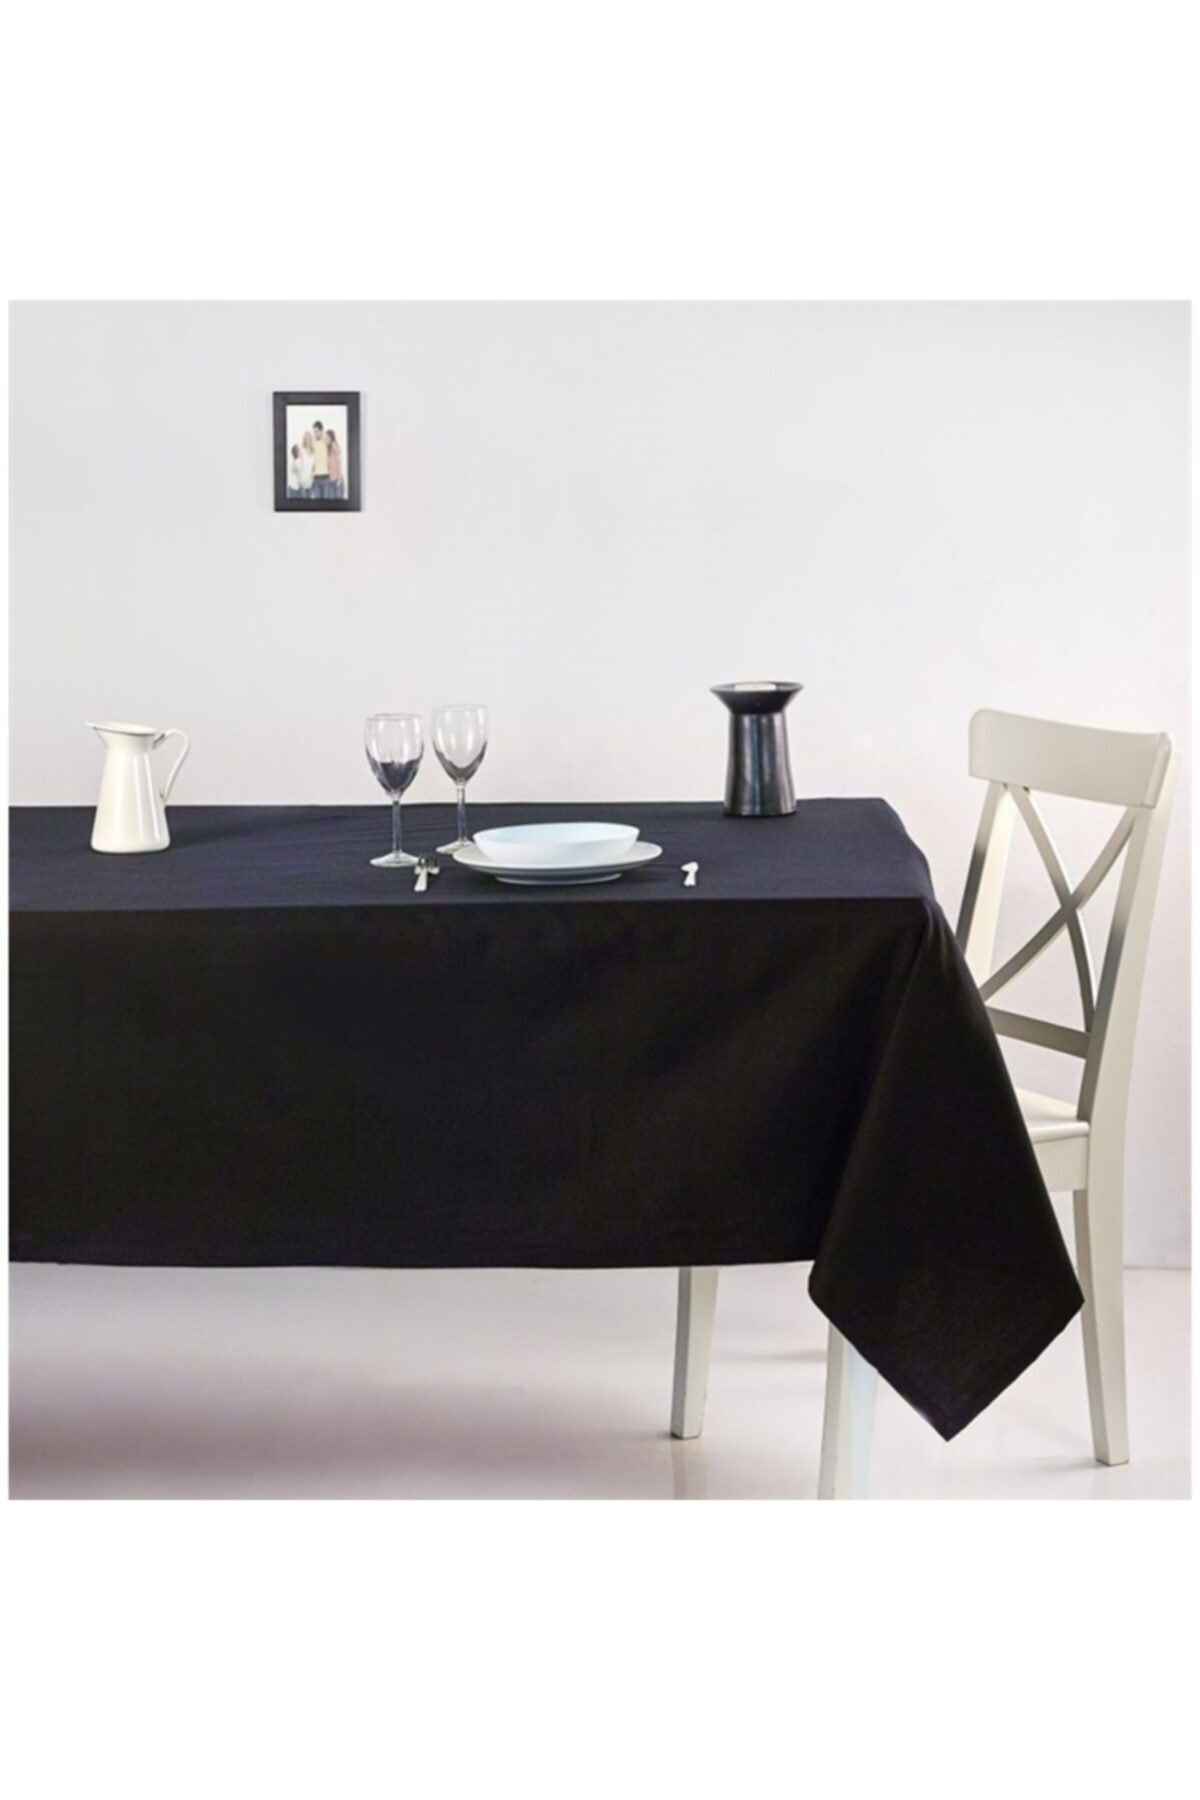 Masa Örtüsü Siyah Seçenekli Ilan Leke Tutmaz Duck Keten Kumaş